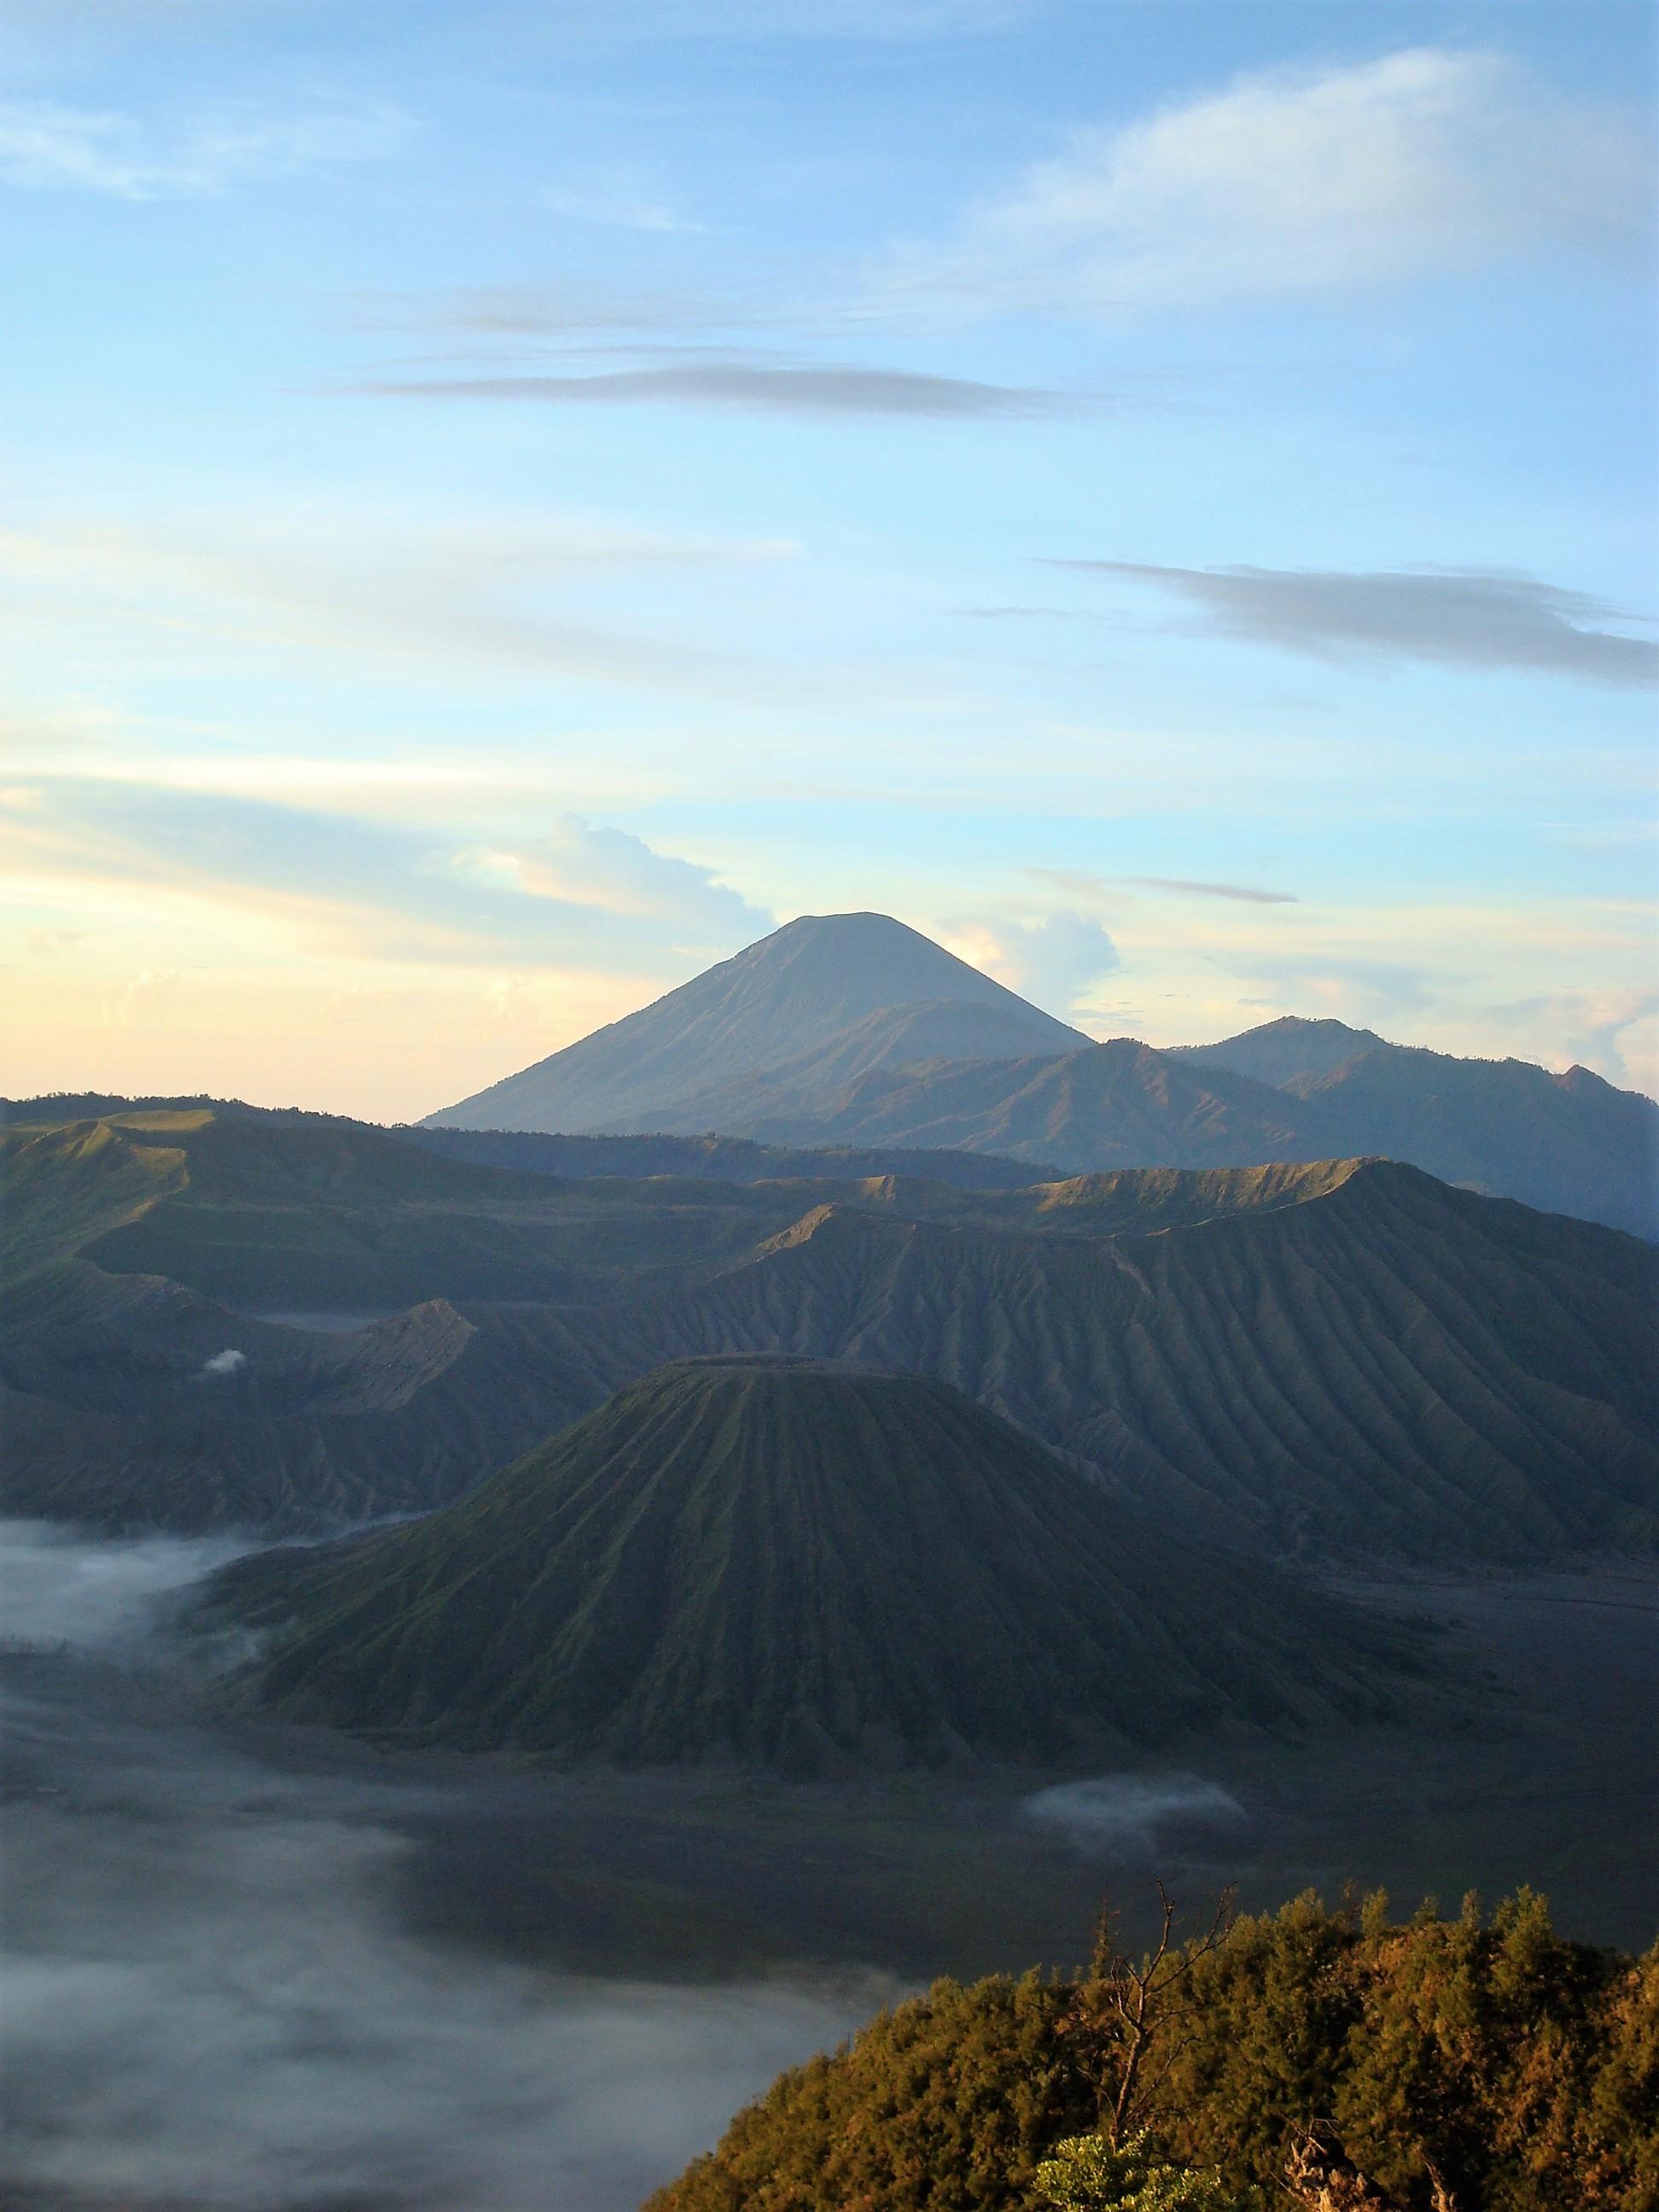 Bromo Tengger Semeru National Park Java 483.jpg Deutsch: Sonnenaufgang im Bromo Tengger Semeru National Park. Hinten ist der Semeru, vorne